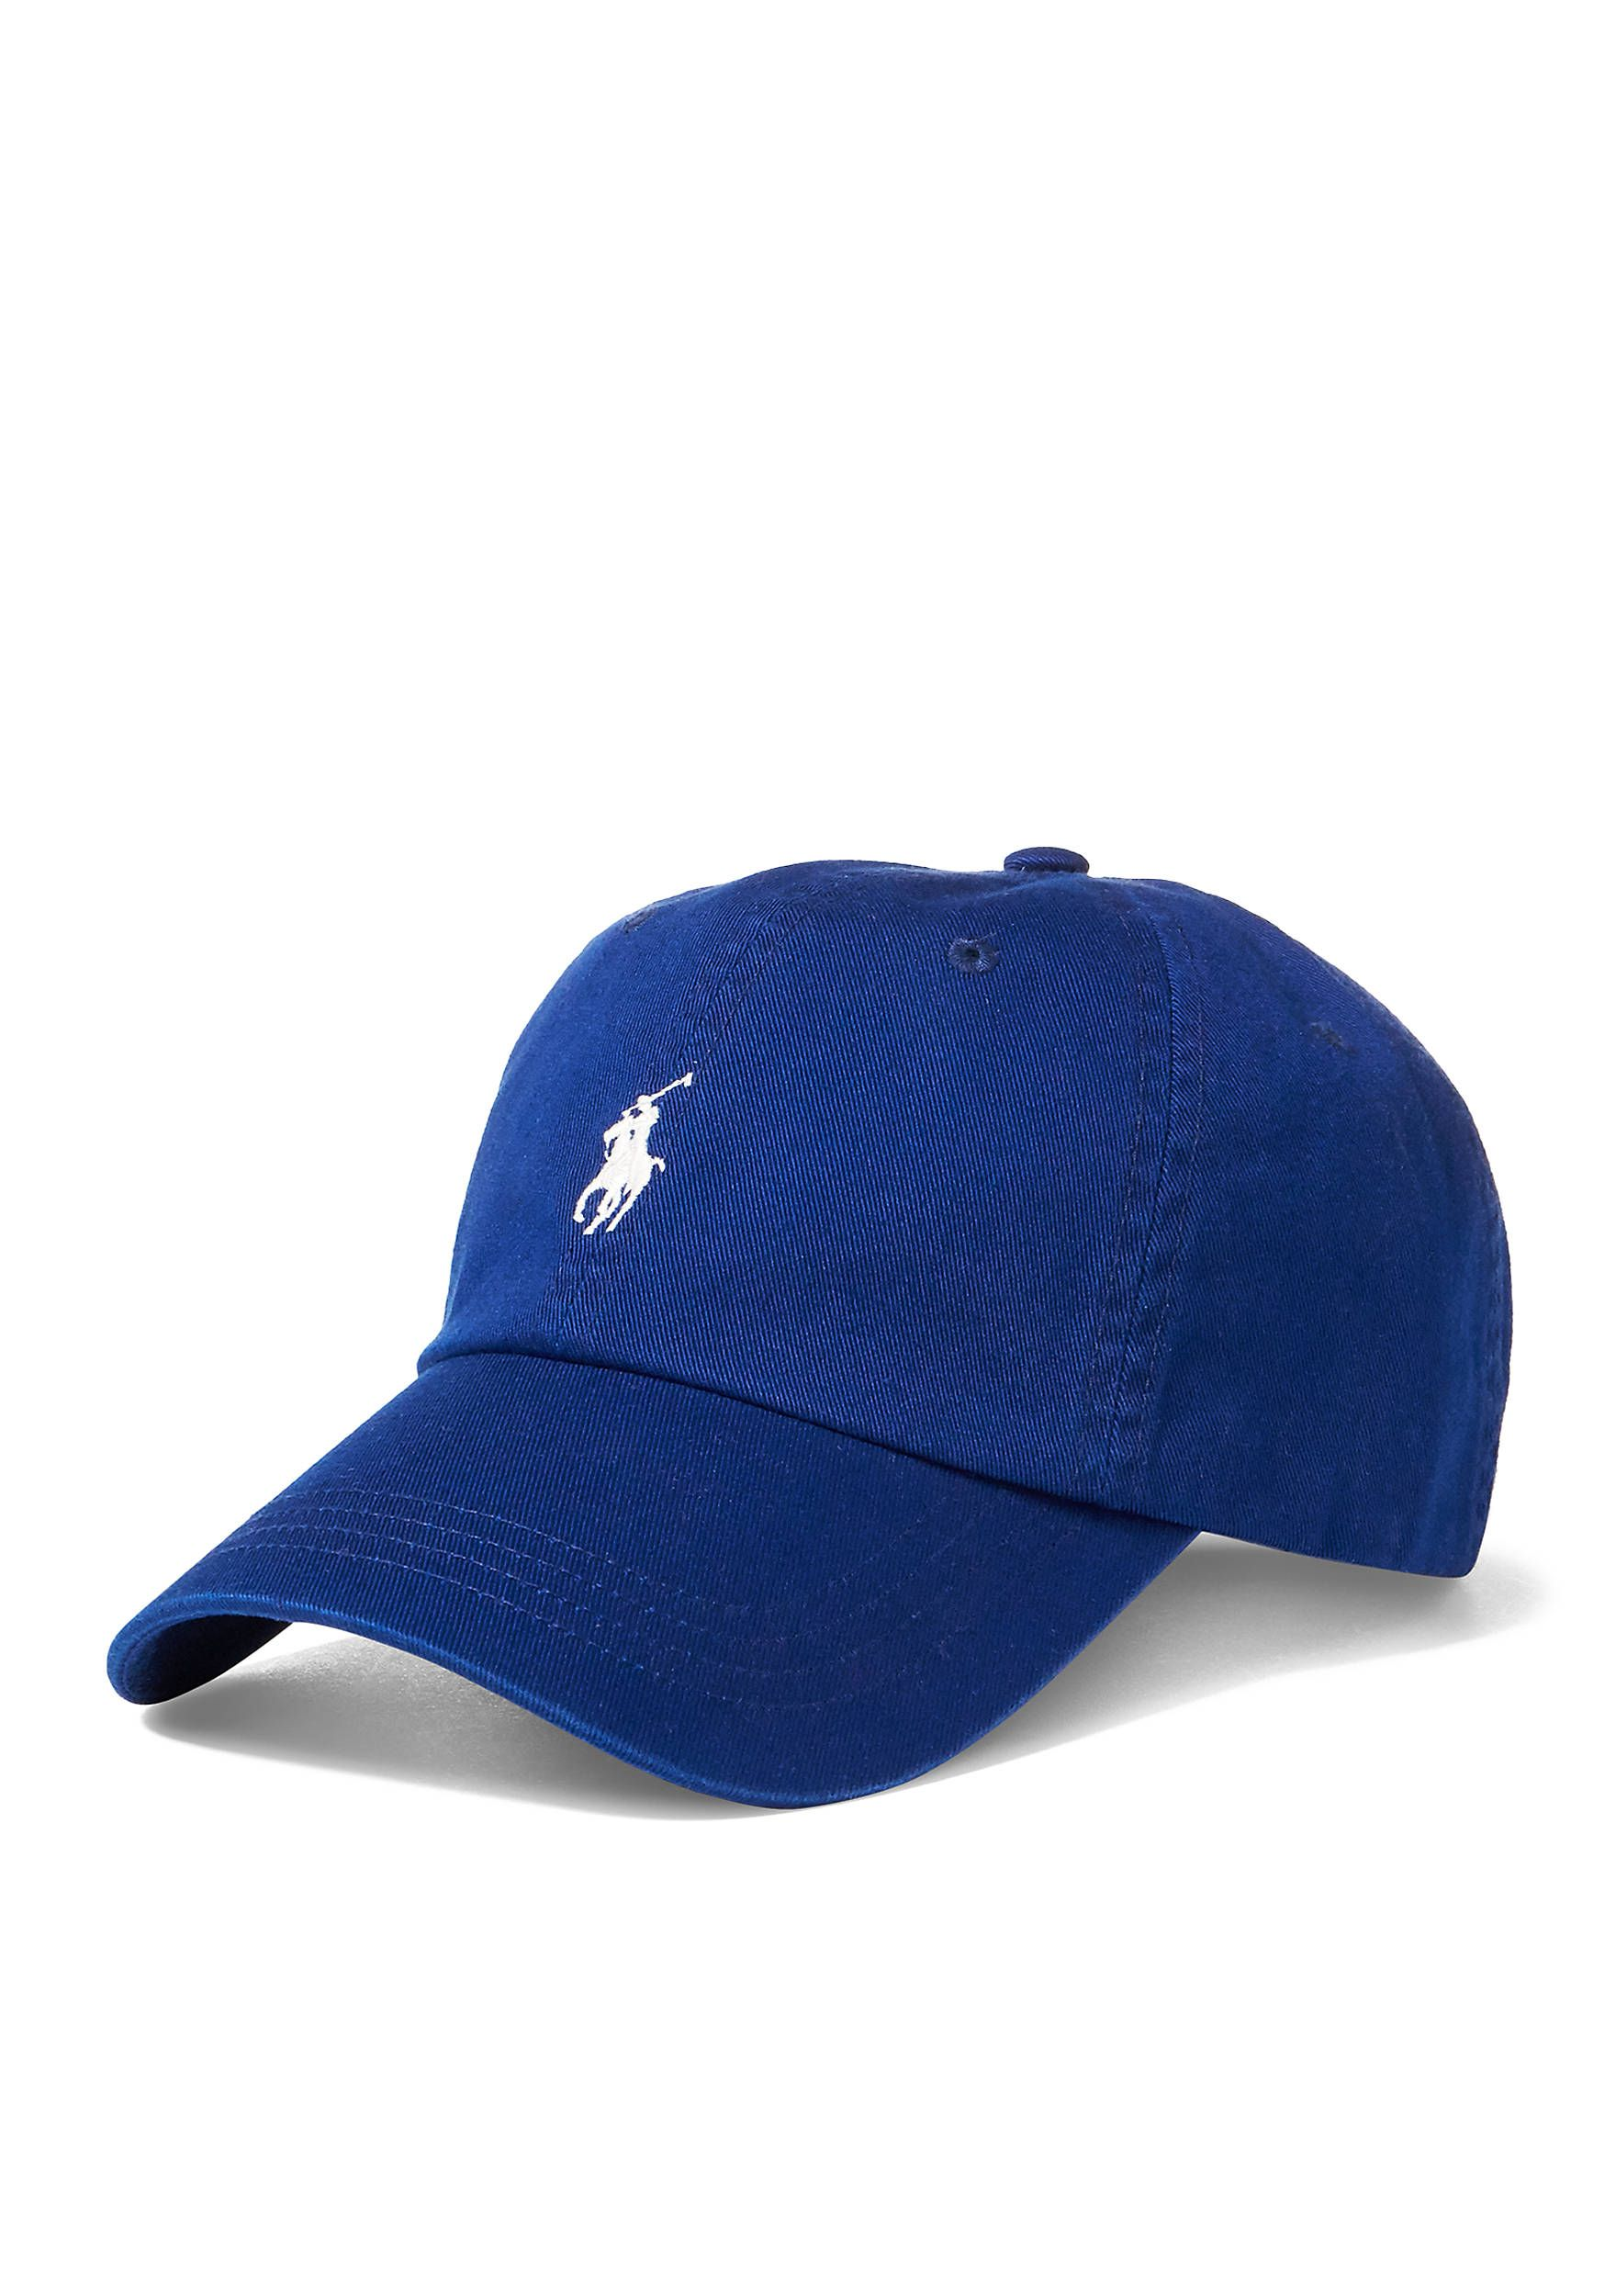 16953fe0a1764 Polo Ralph Lauren Classic Chino Sports Cap Fall Royal Men s Accessories Hats   FallRoyal 32016021208802